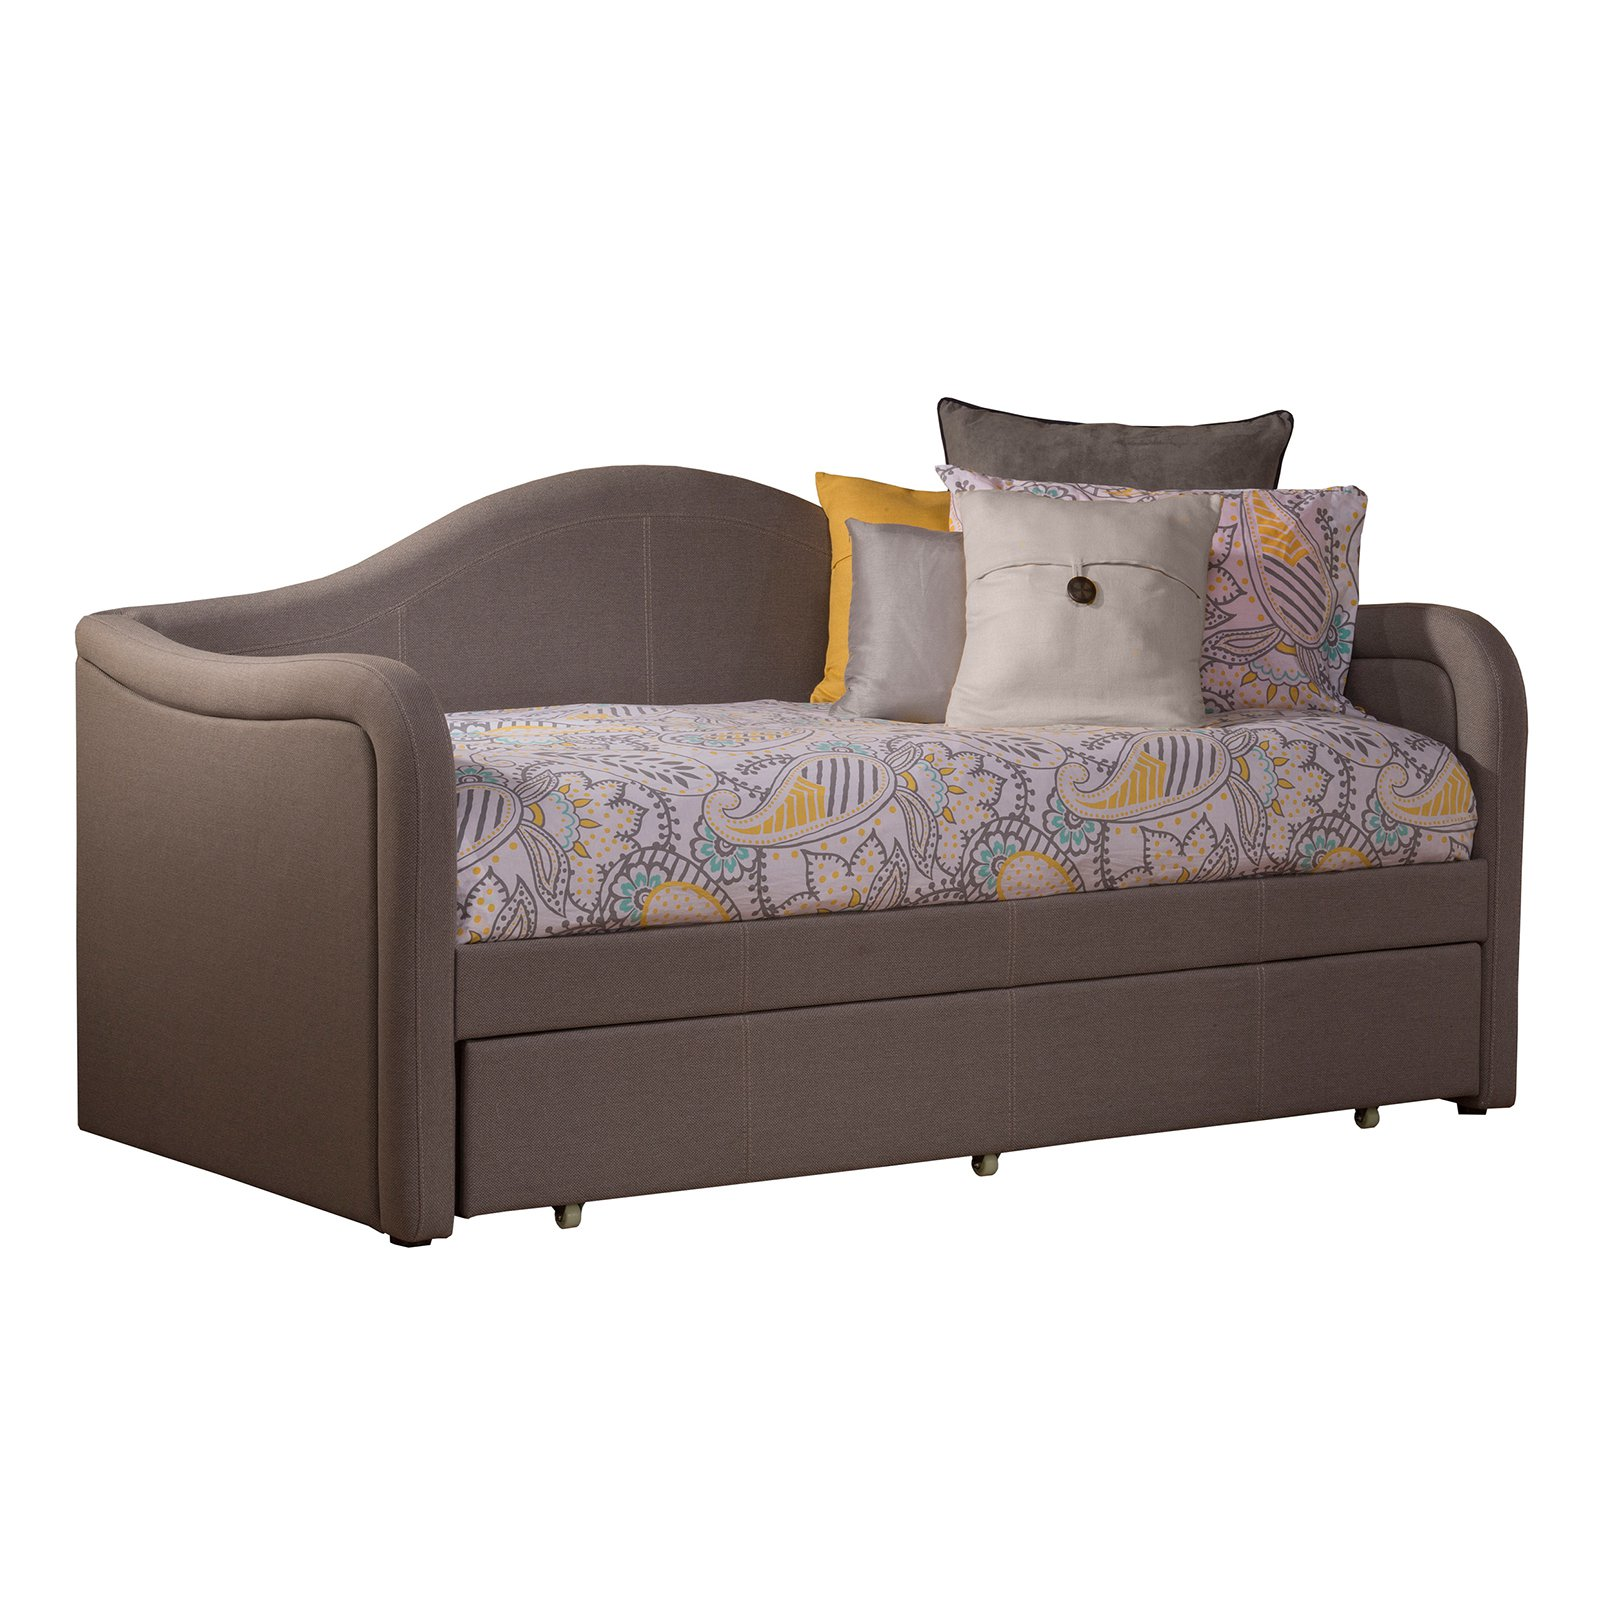 Upholstered Daybed hillsdale furniture porter daybed - walmart